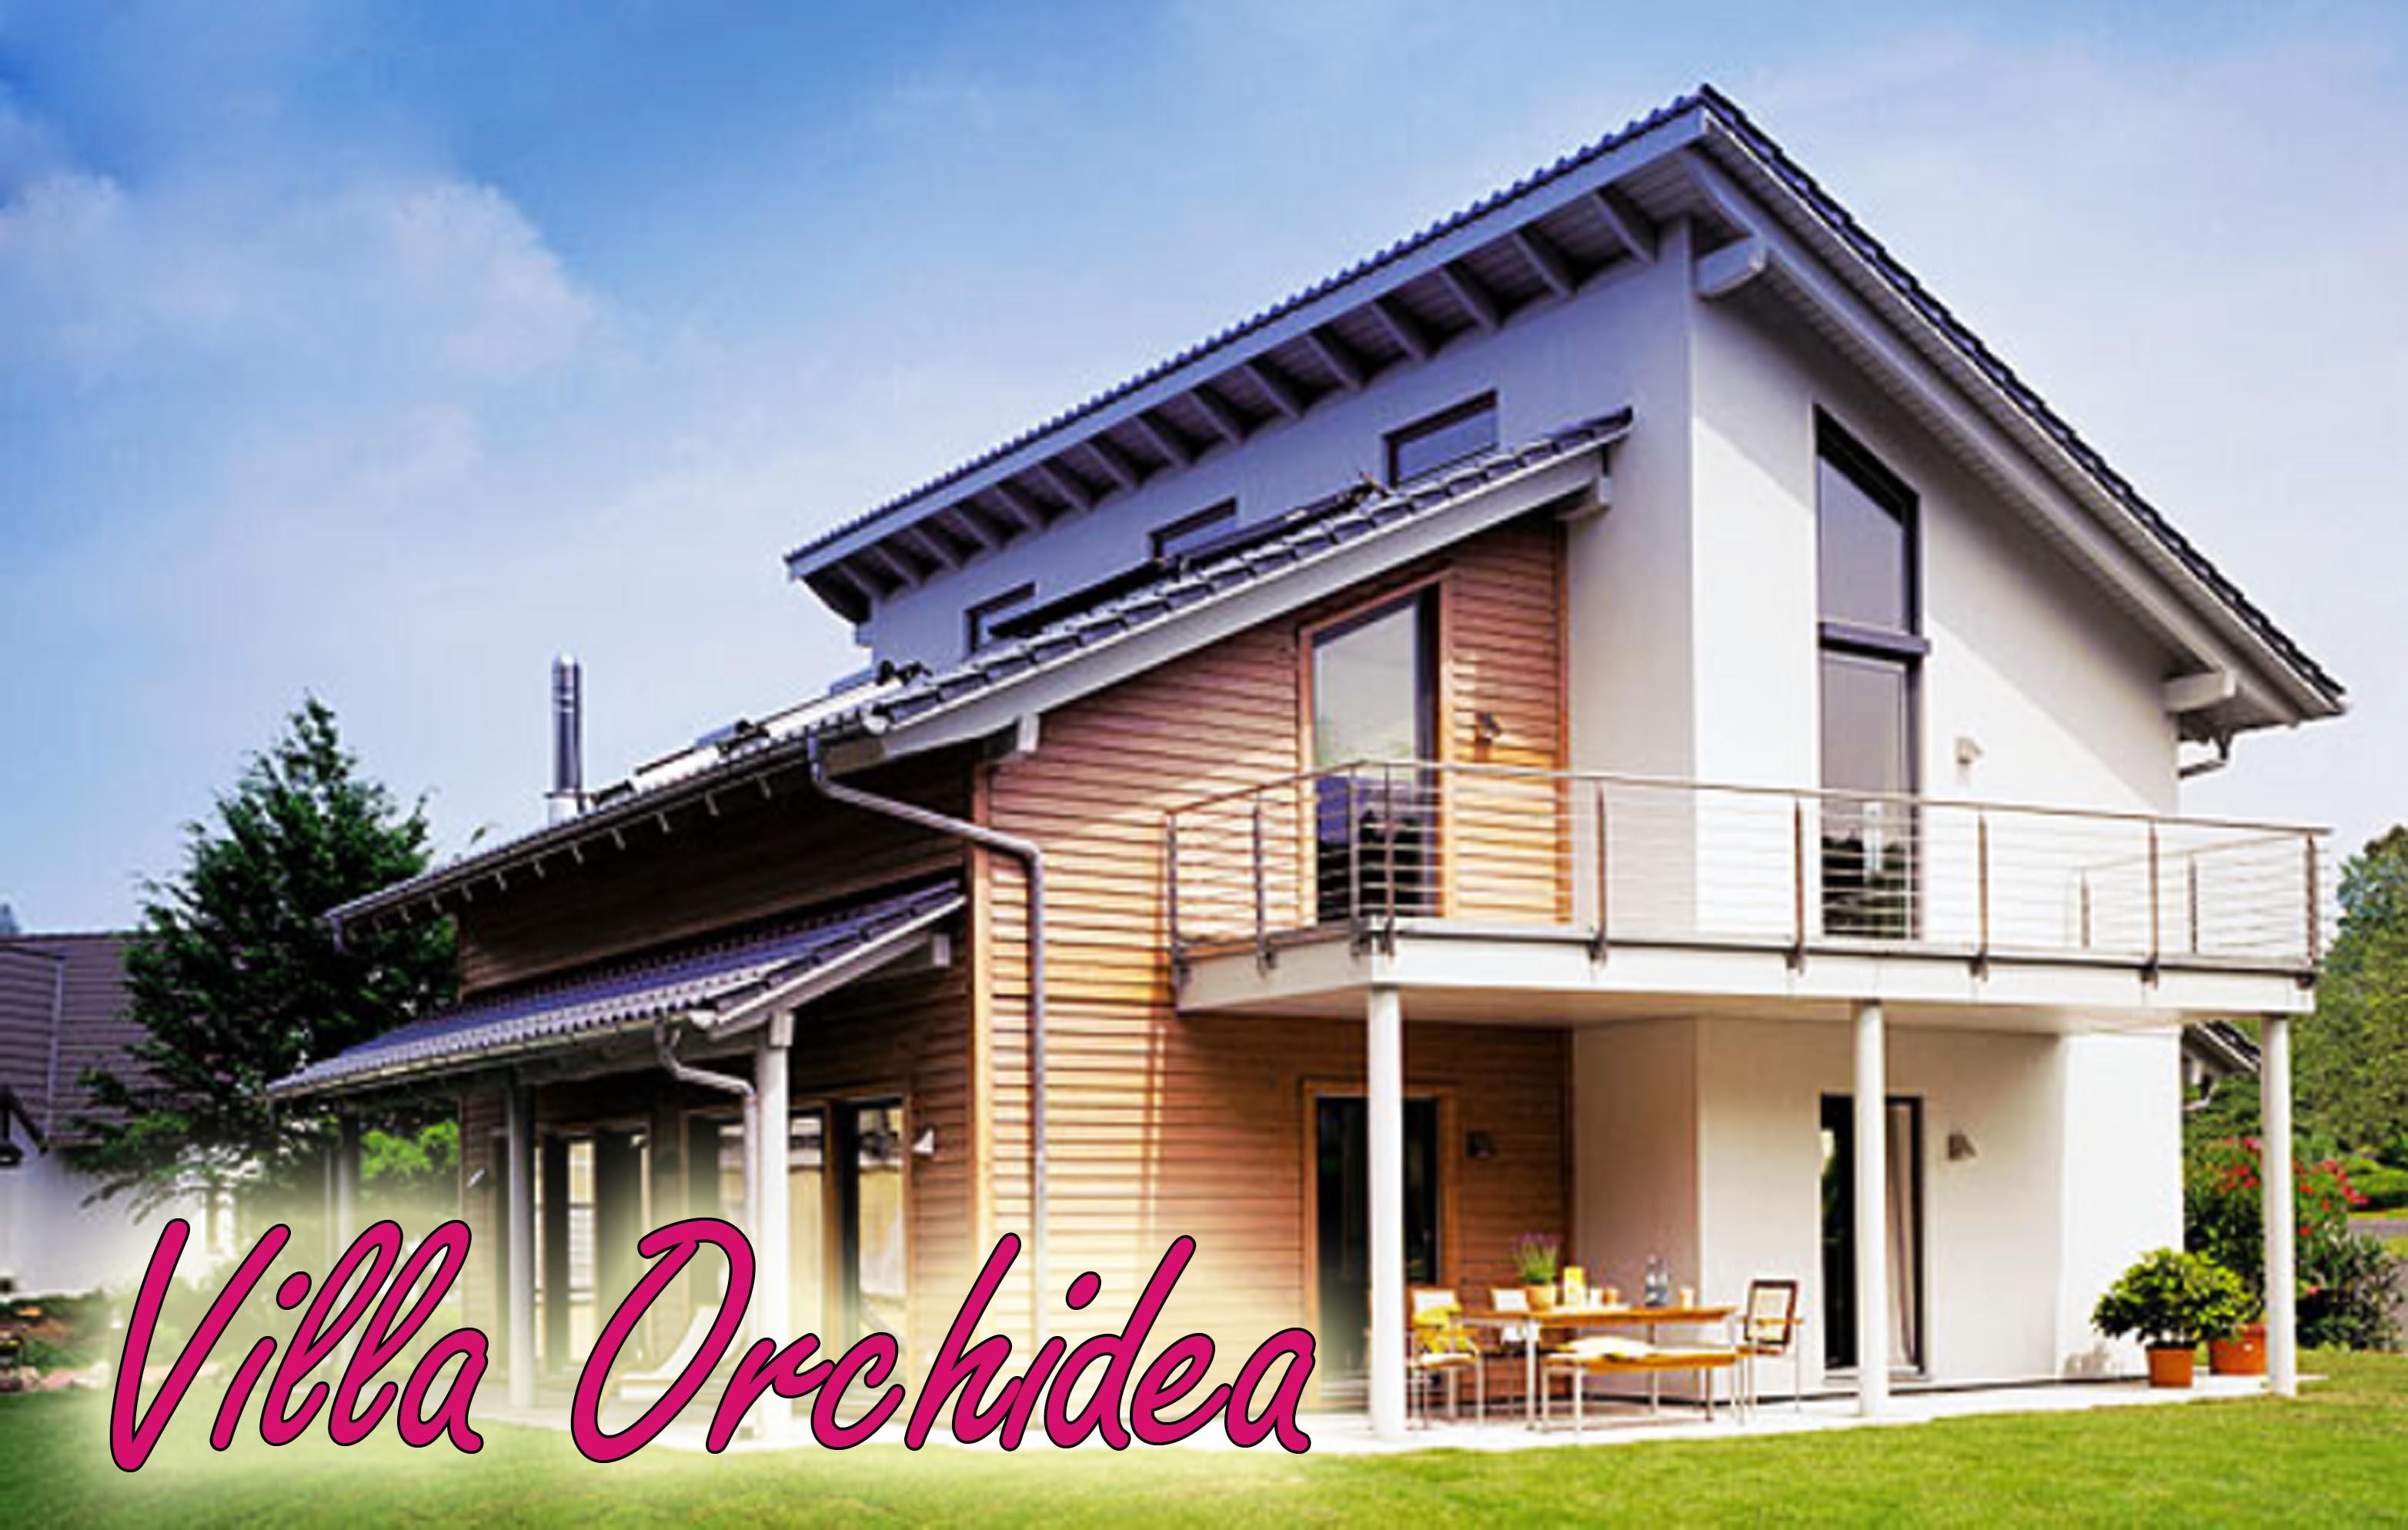 Casa Prefabbricata - Villa Orchidea